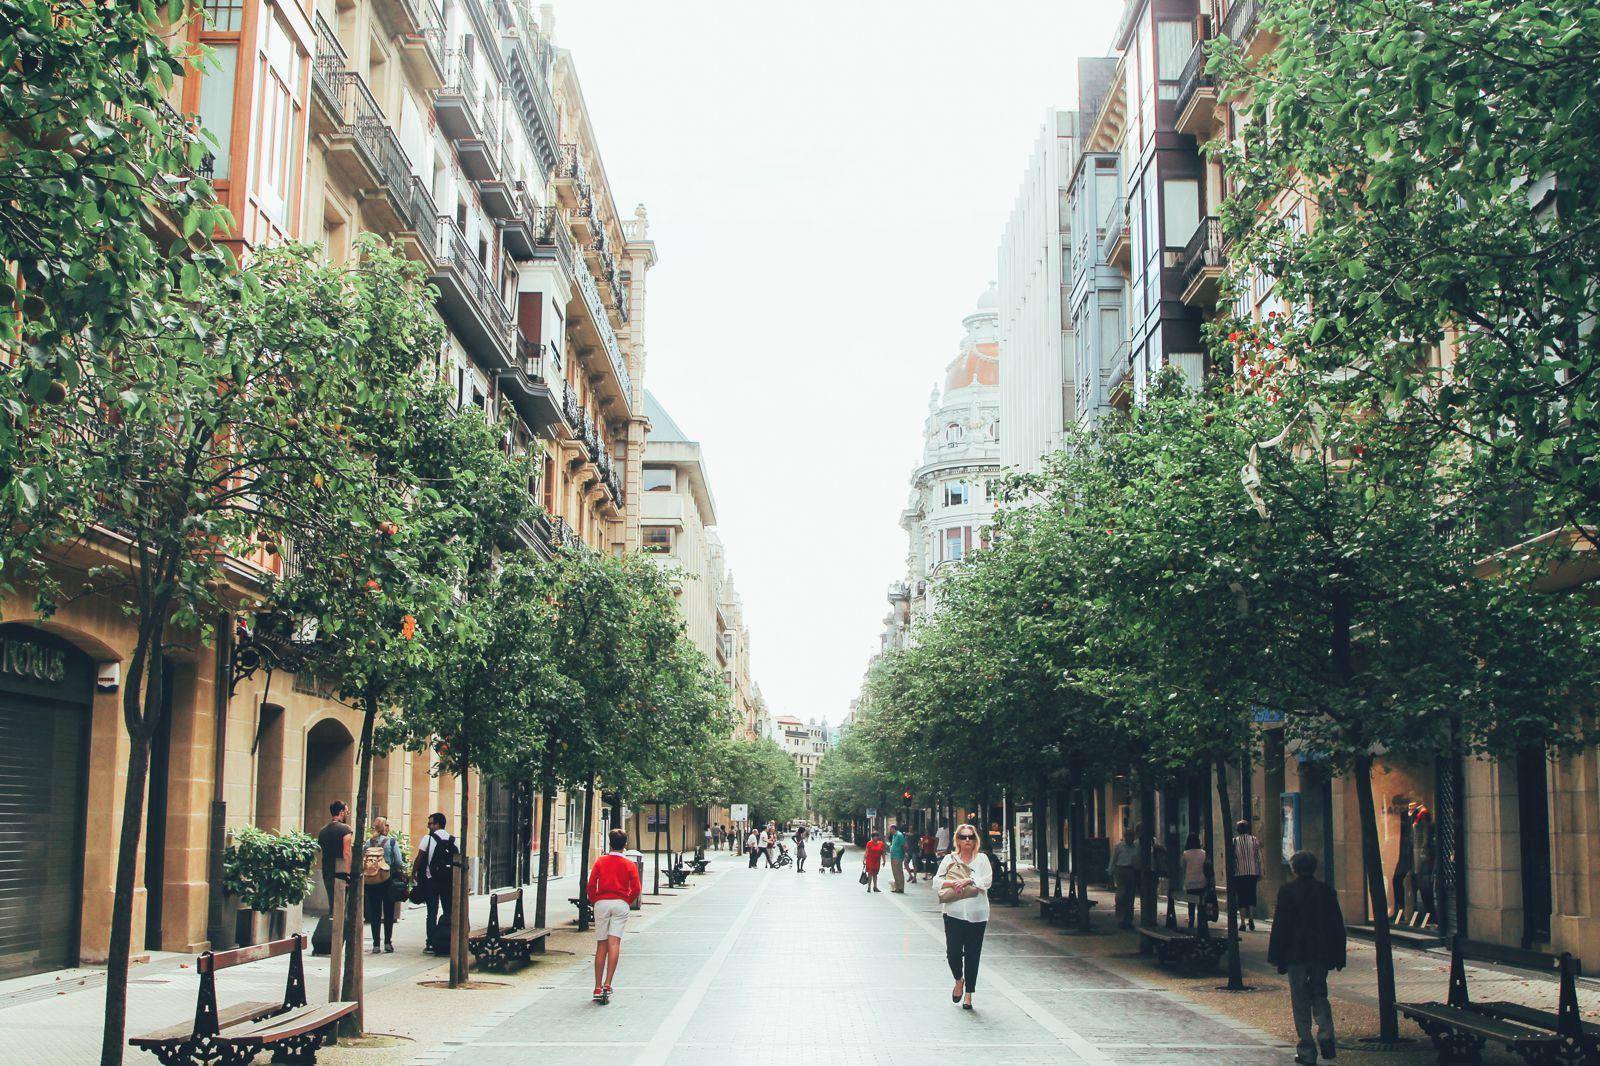 The Most Beautiful City in Spain. San Sebastian, Gipuzkoa, Spain, Hotel Londres (6)